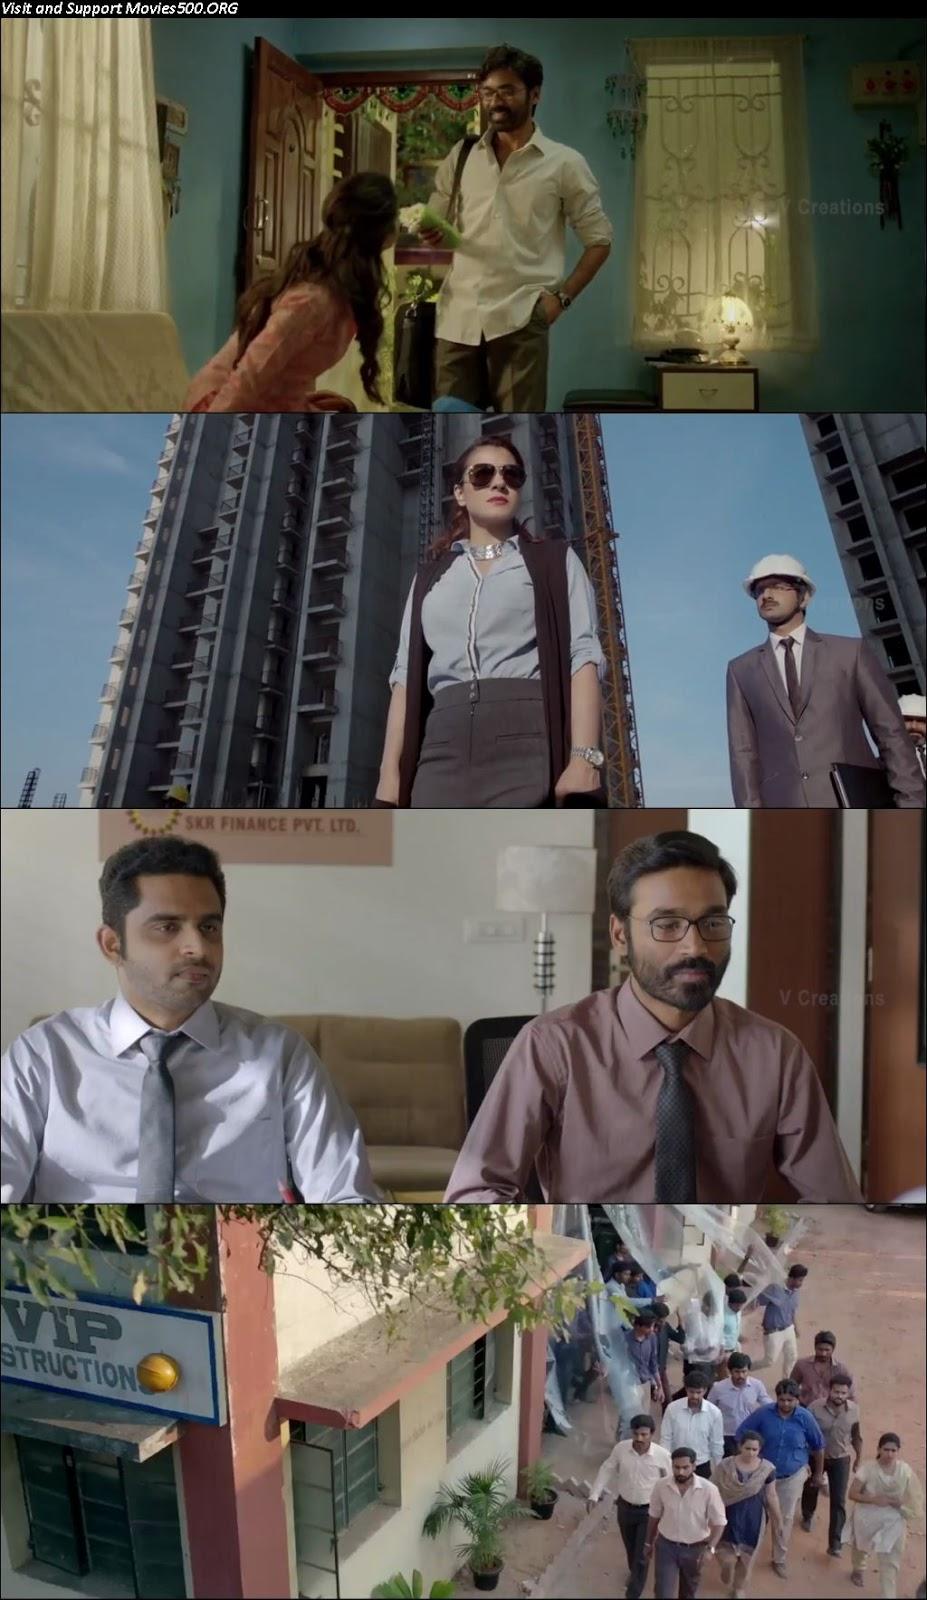 VIP 2 Lalkar 2017 Full Movie 300MB Download HDRip 480p at movies500.site